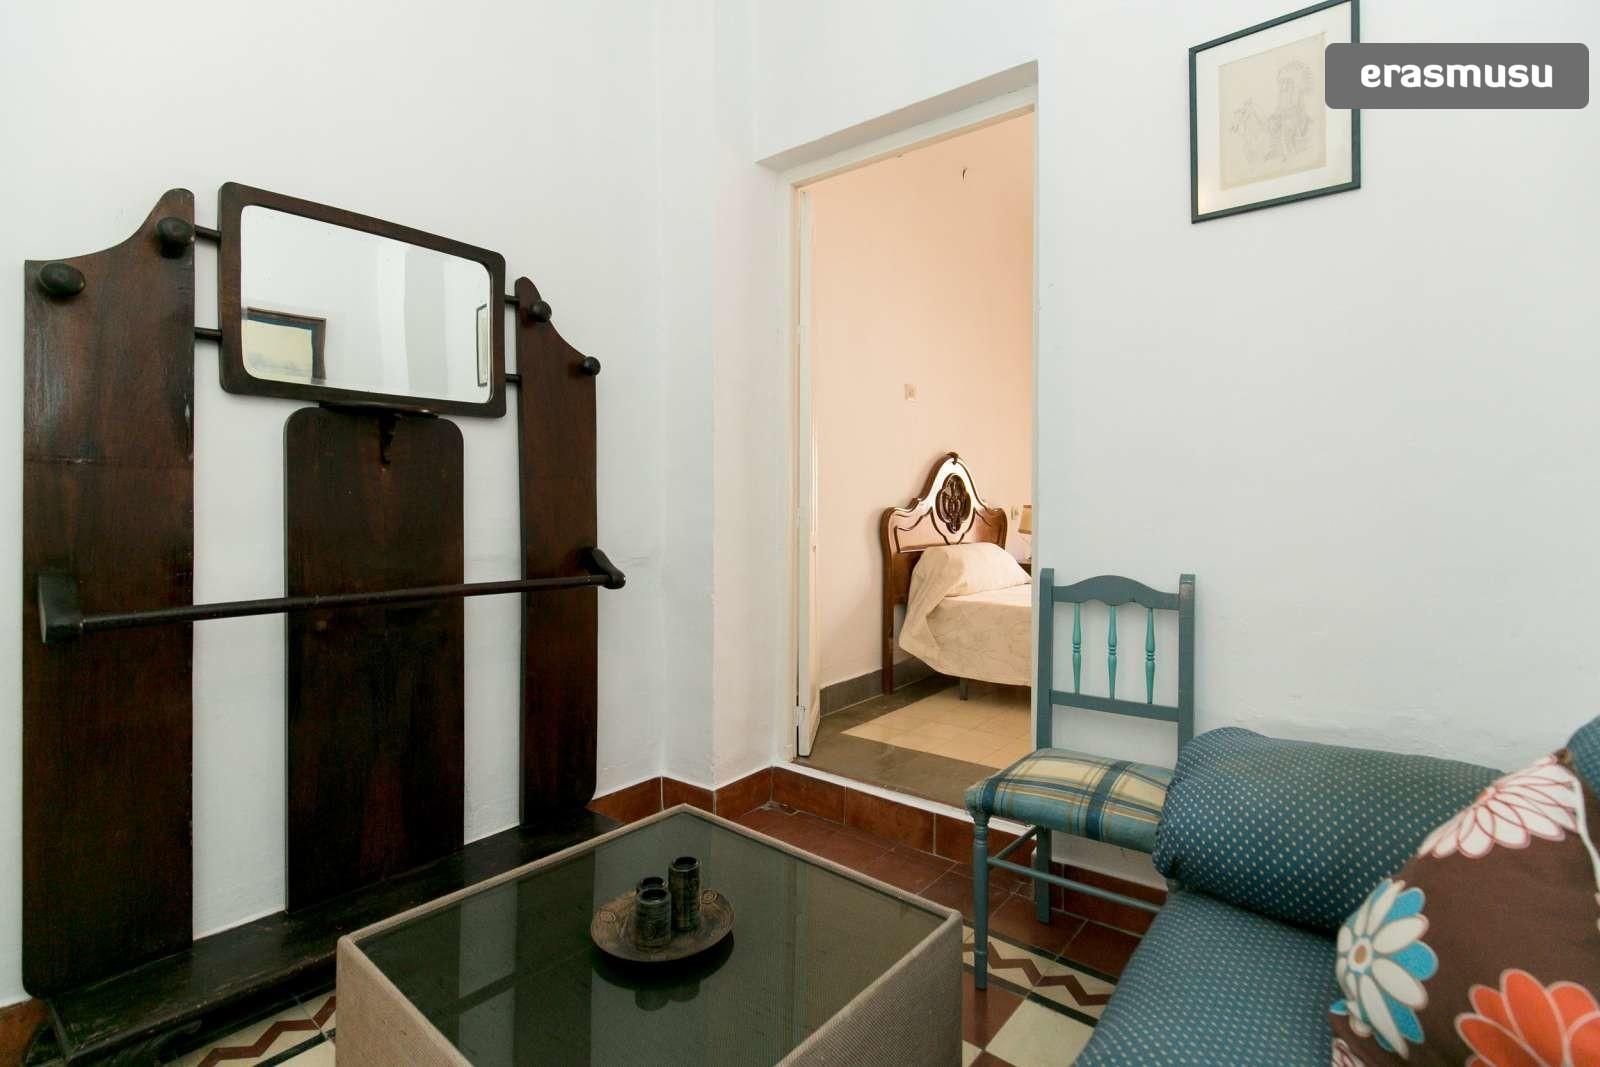 spacious-3-bedroom-apartment-rent-realejo-078b4e74ccfa0b844f5417